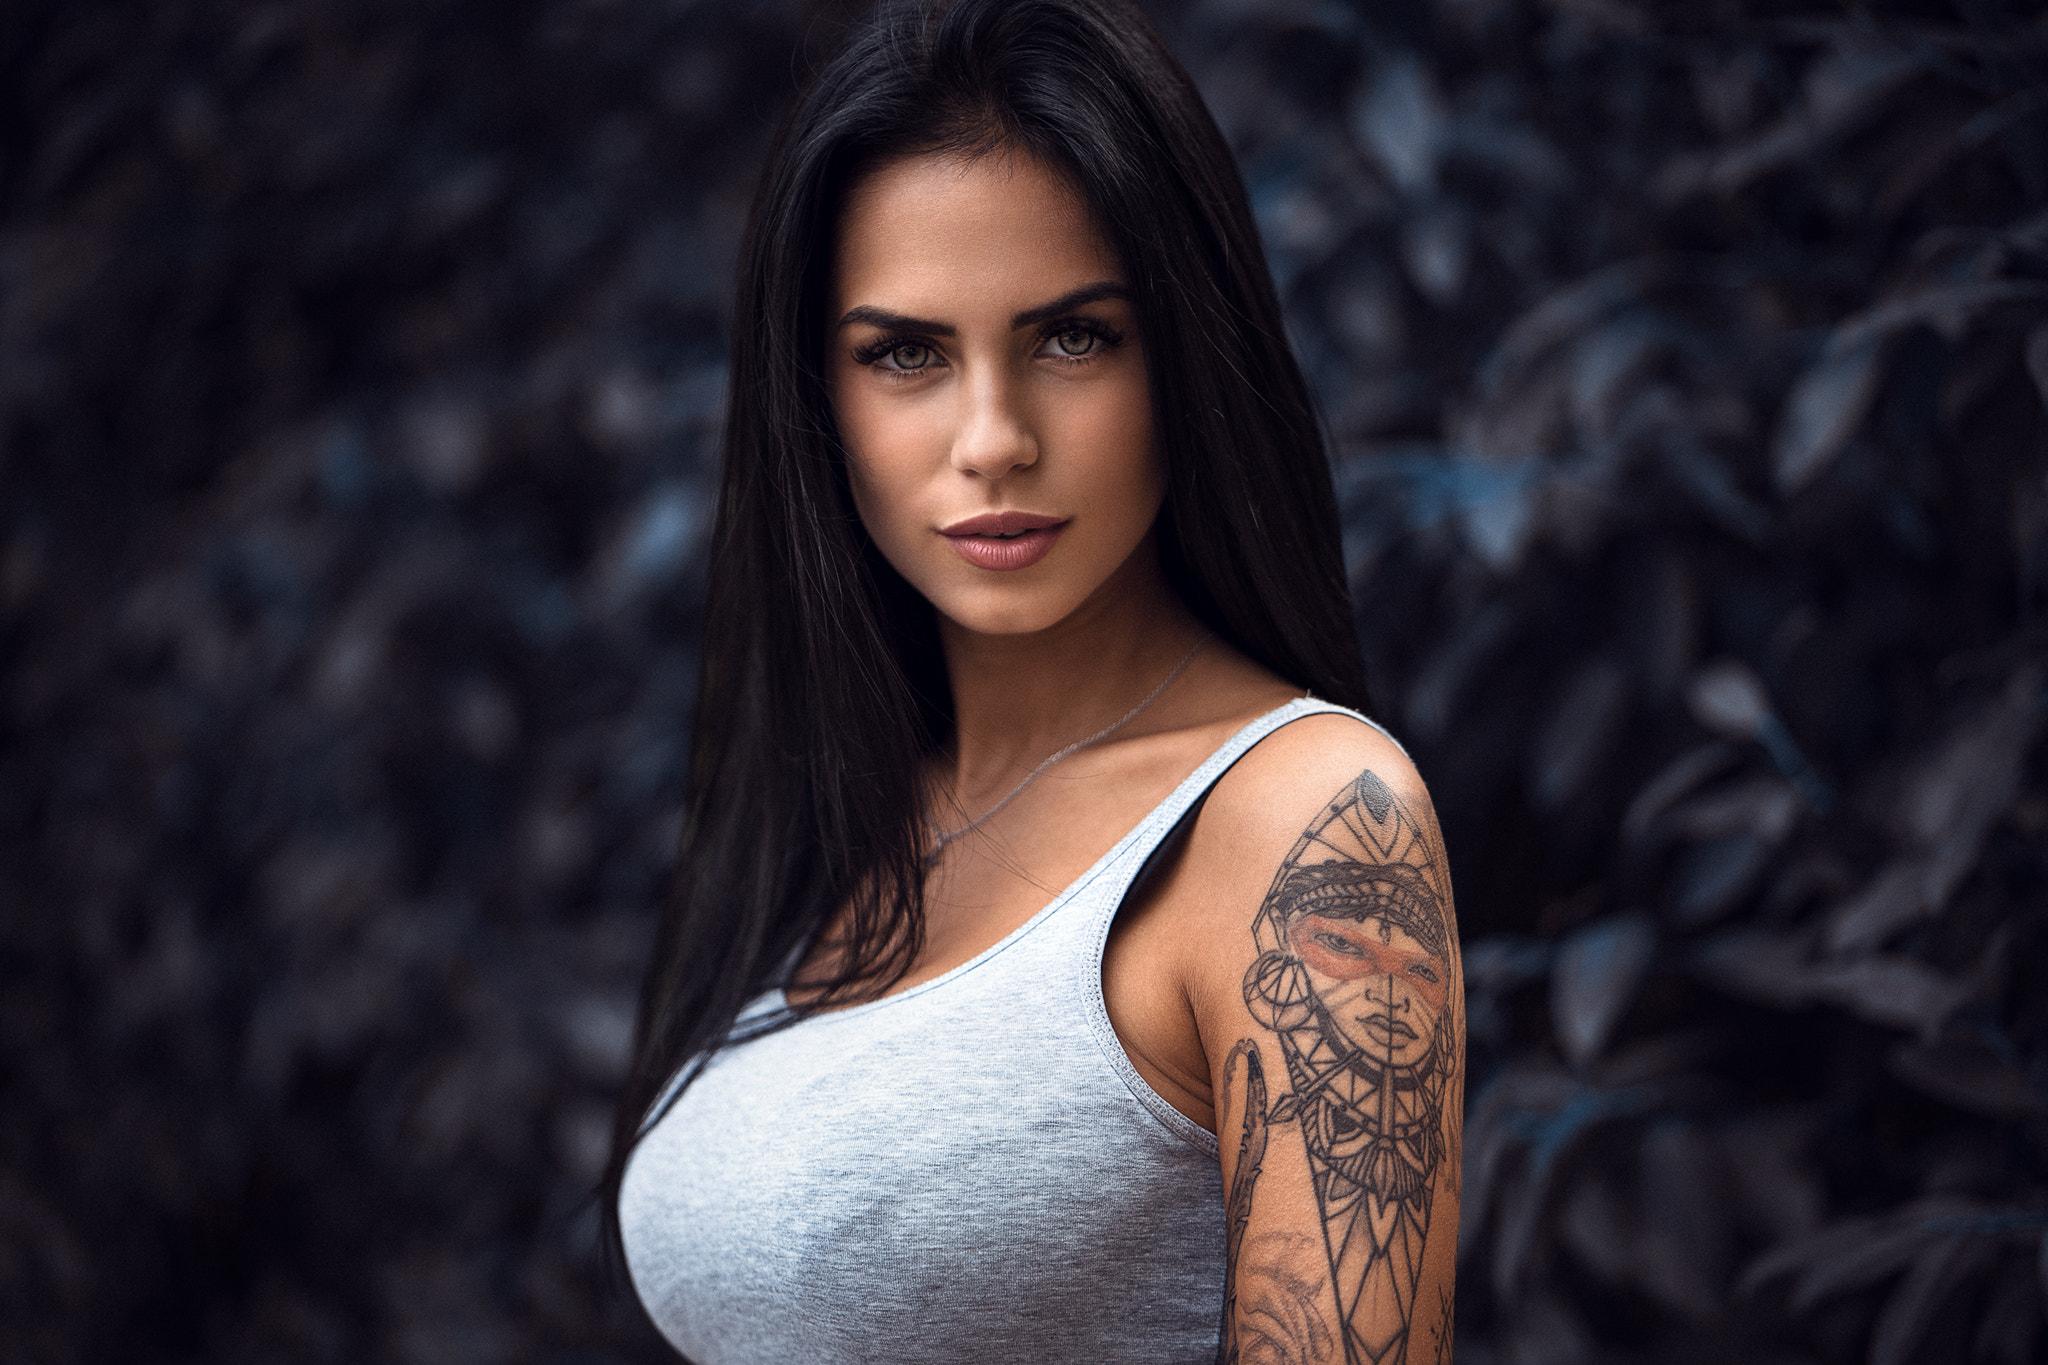 People 2048x1365 women brunette women outdoors face black hair long hair tank top tattoo tanned green eyes portrait bokeh Marlen Valderrama Alvaréz Anatoli Oskin